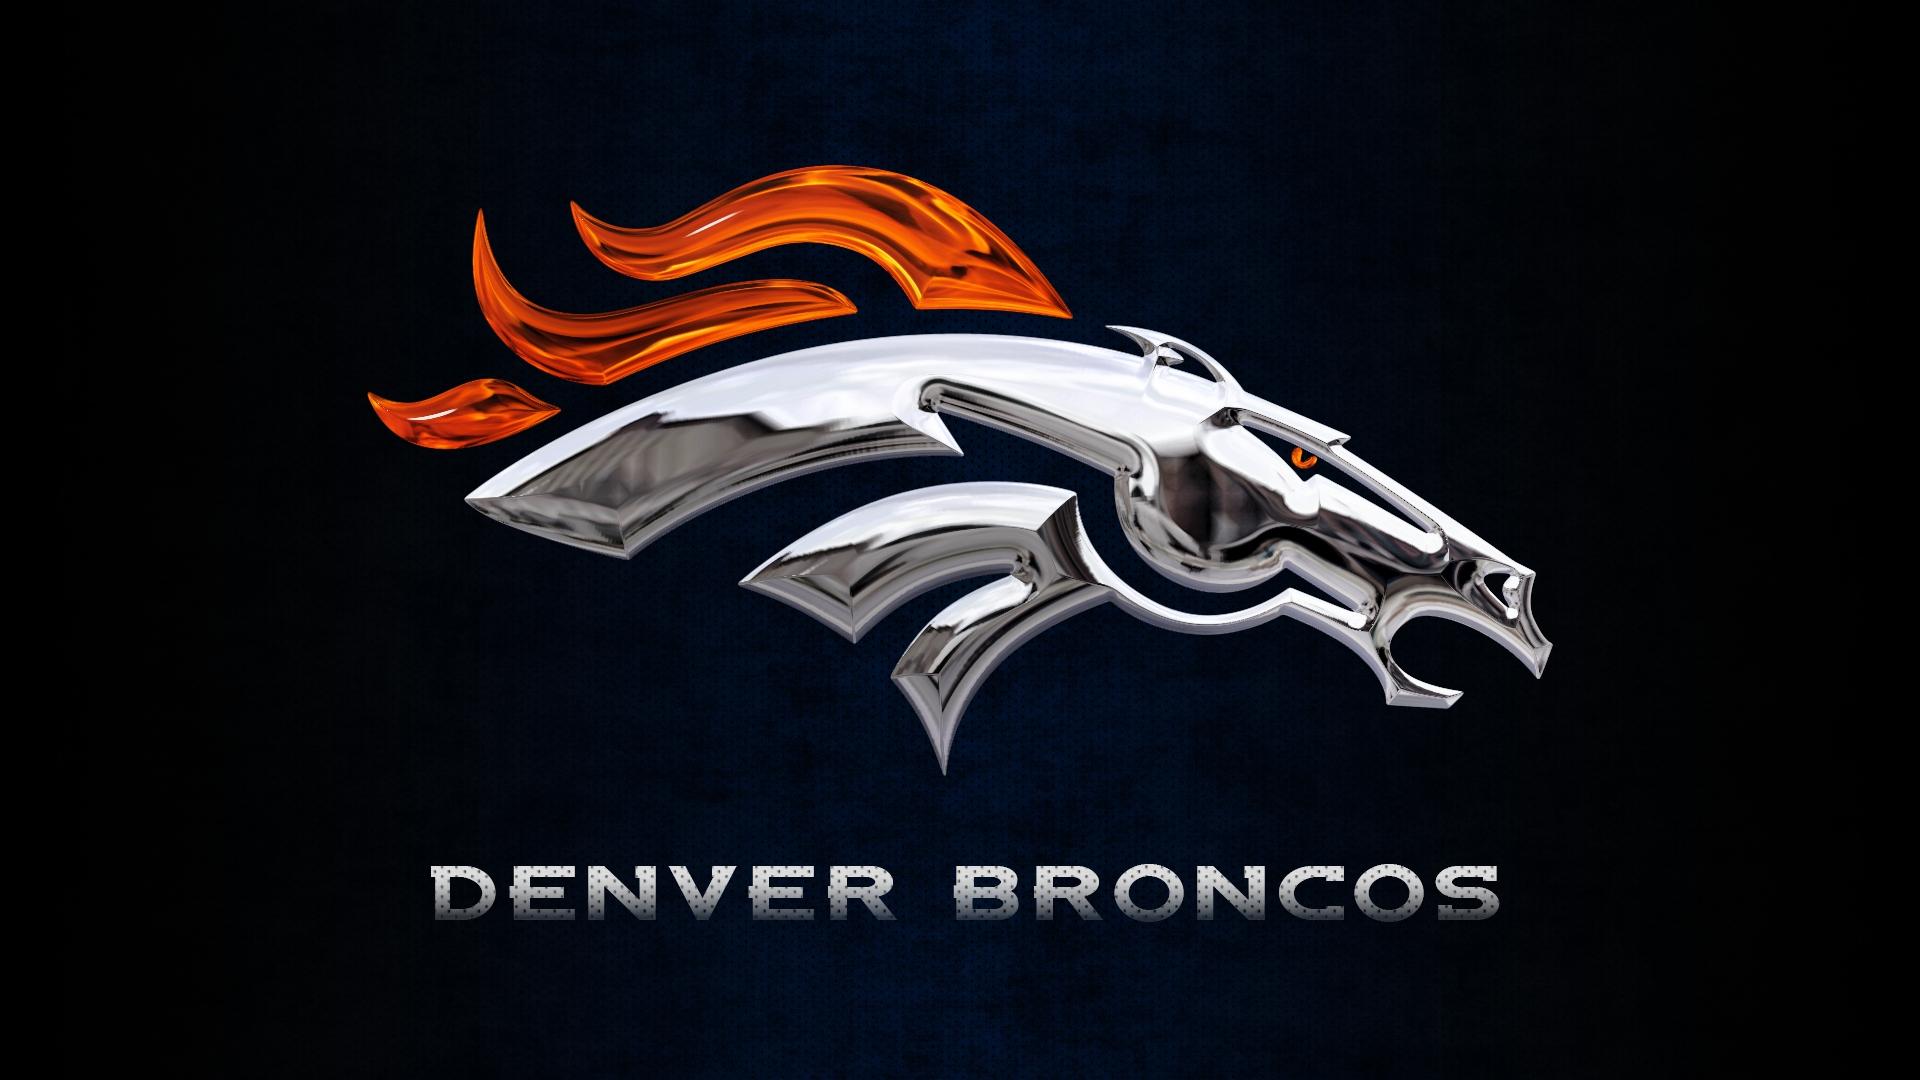 10 Top Denver Broncos Wallpaper Free FULL HD 1920×1080 For PC Background